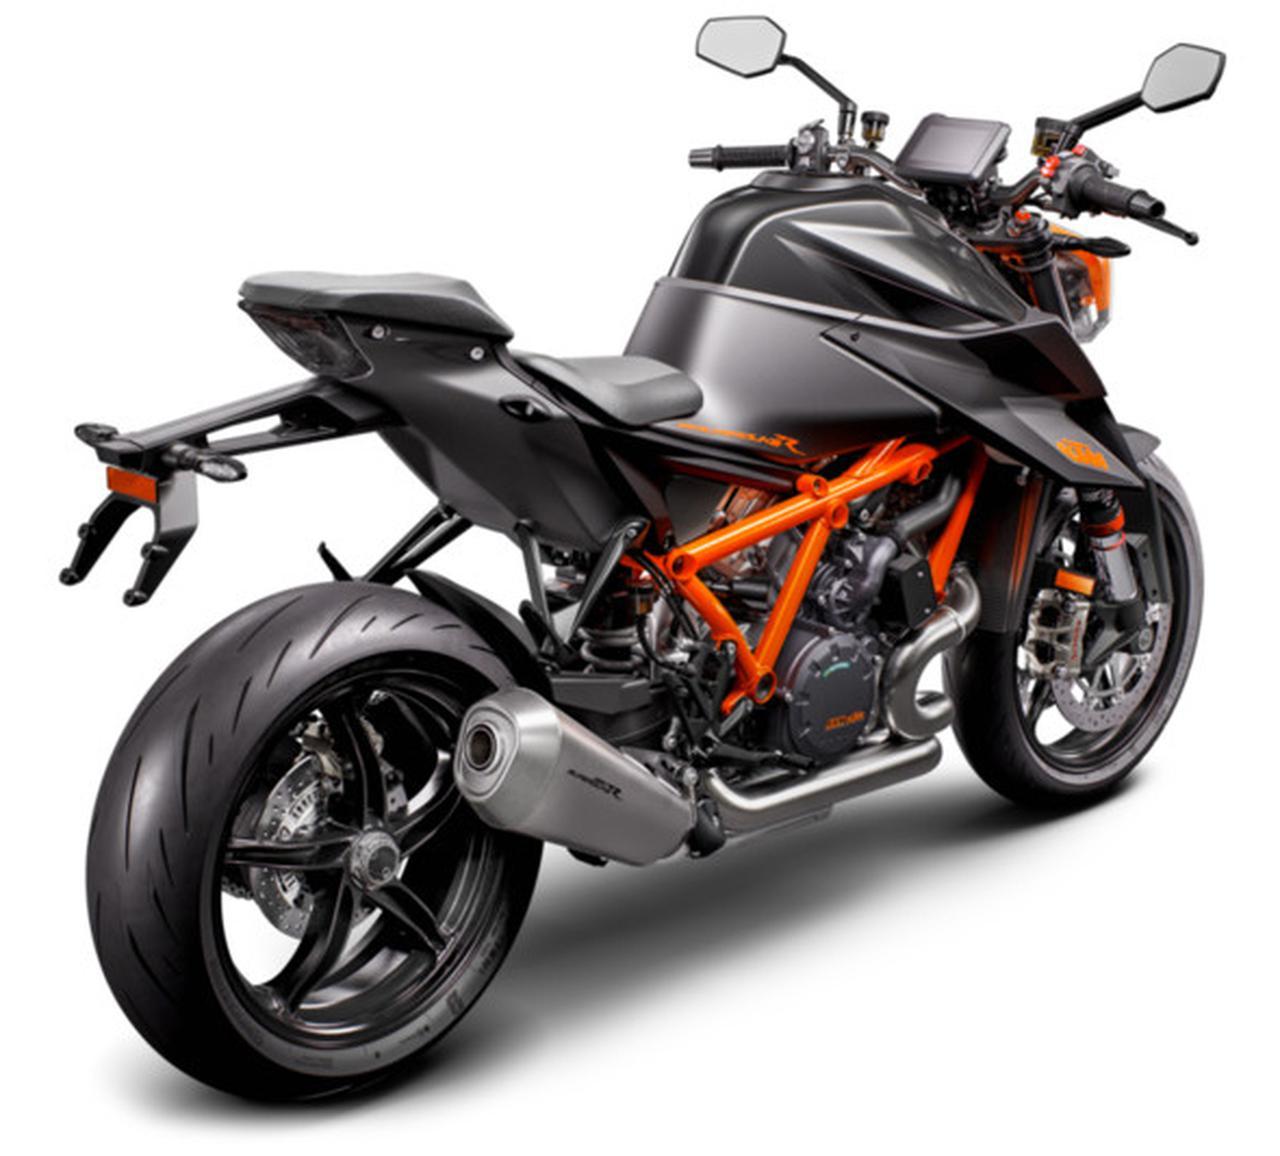 Images : 6番目の画像 - KTM「1290 SUPER DUKE R」の写真を全て見る! - webオートバイ